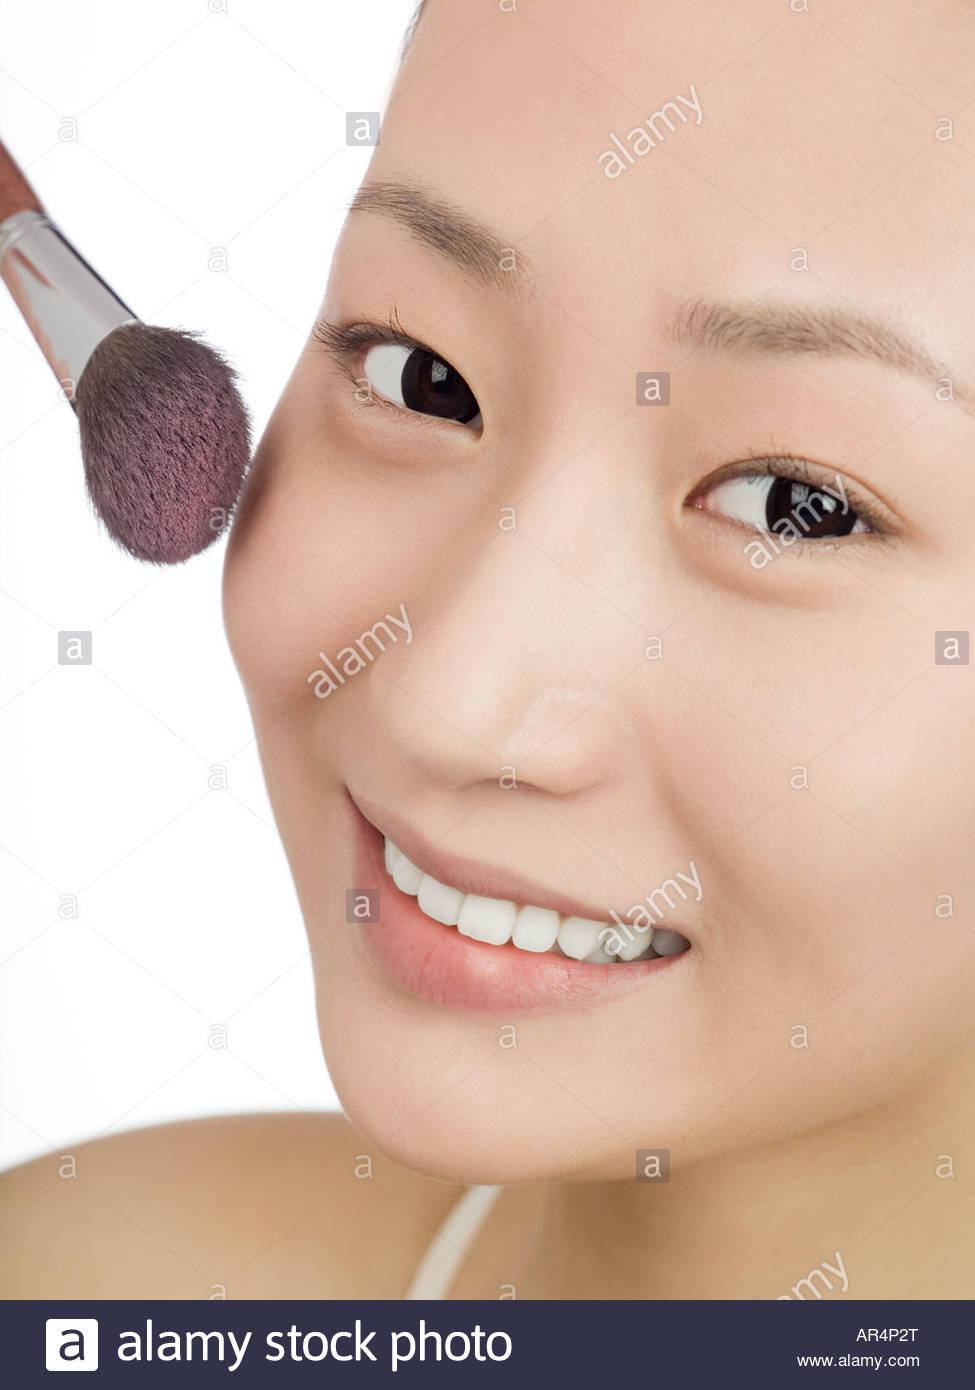 Chinese woman applying blusher - Stock Image